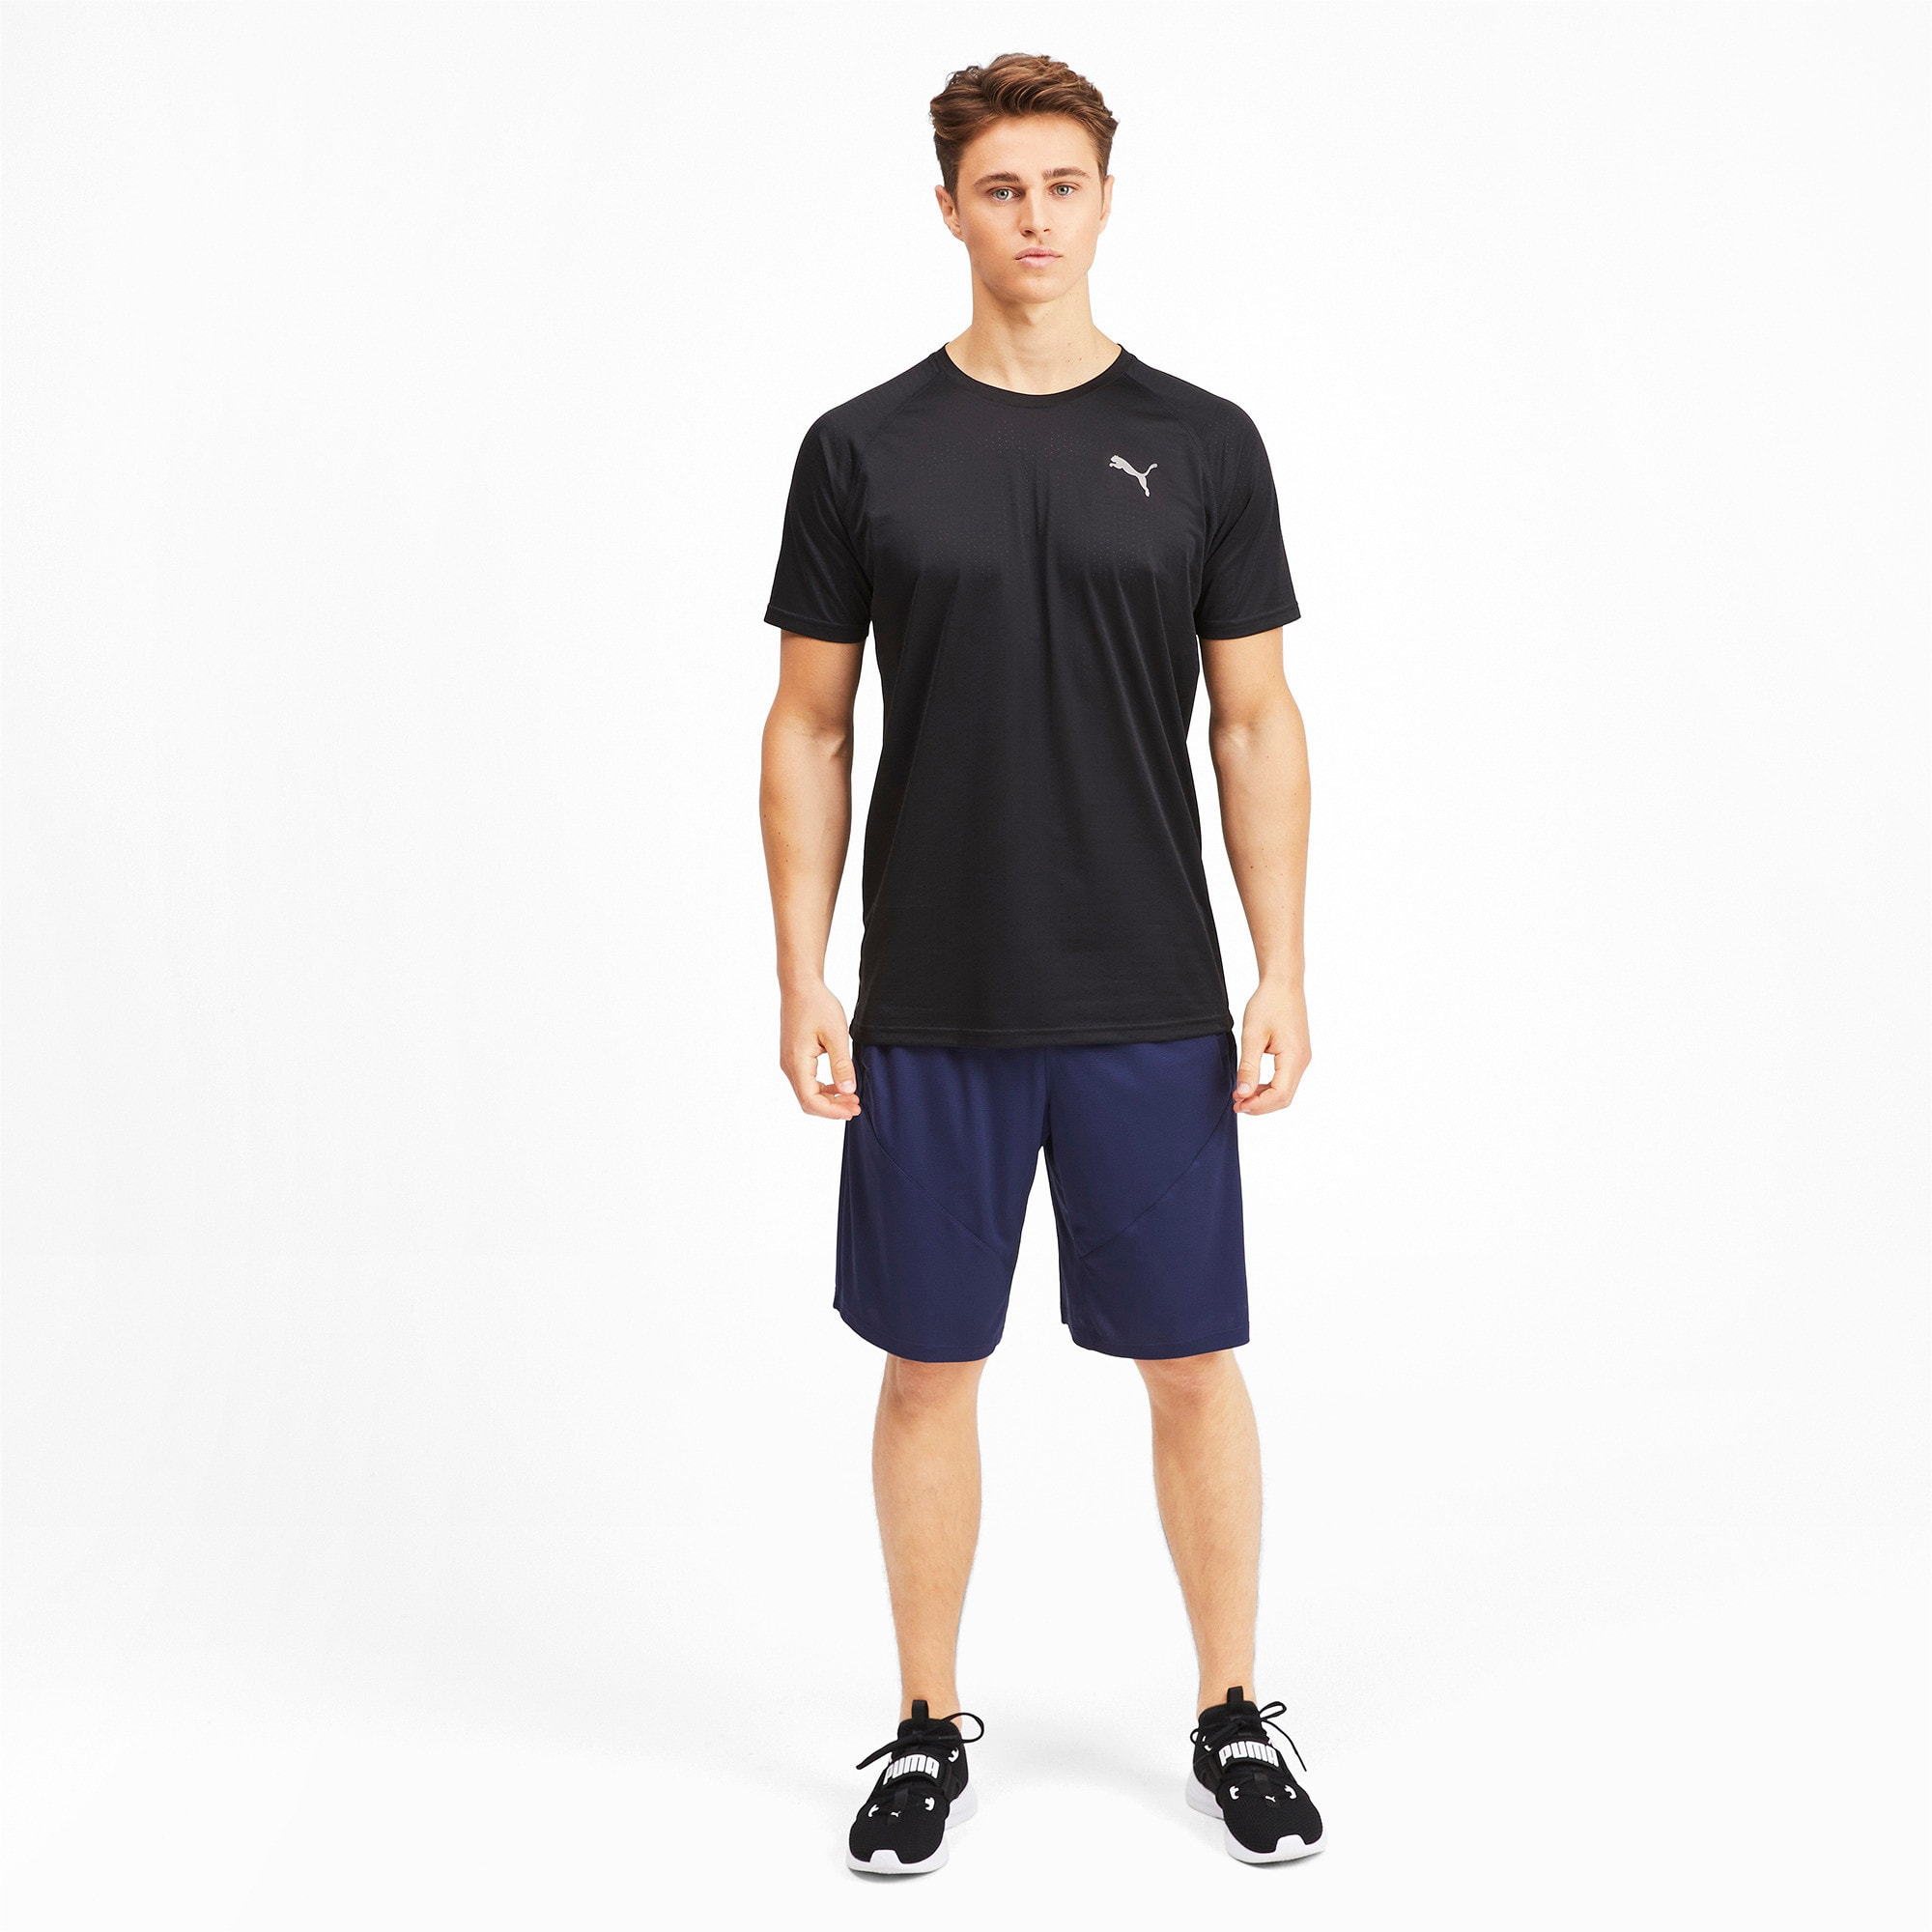 Thumbnail 3 of Tech Herren Training T-Shirt, Puma Black, medium